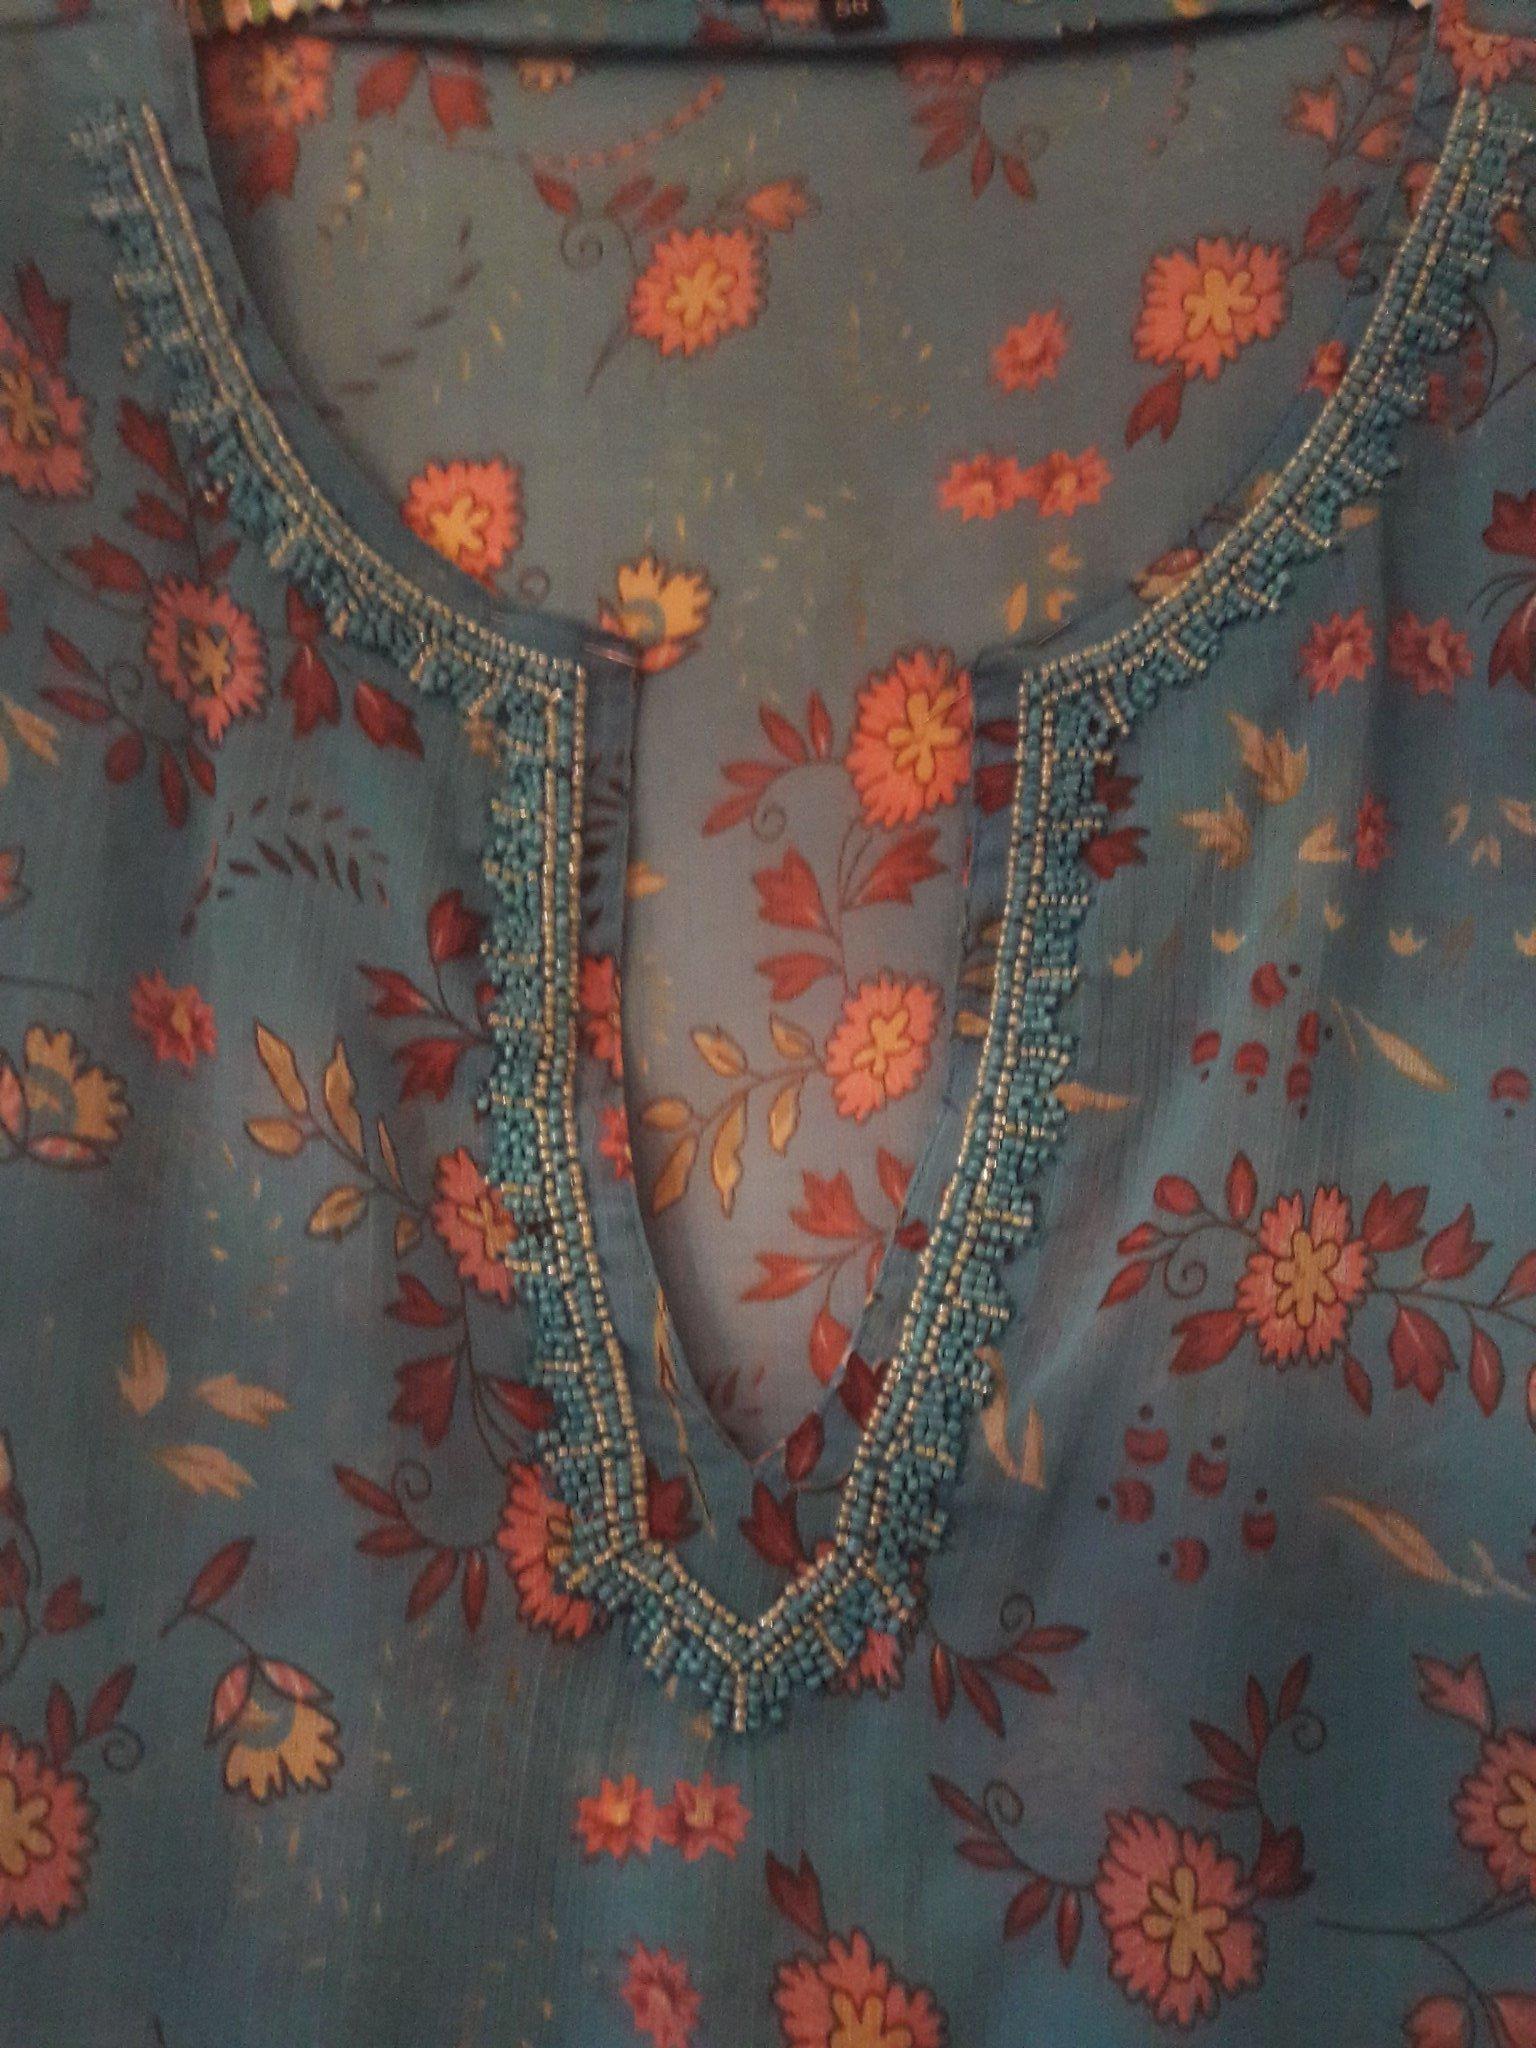 cc50ad1a8d9c Turkosmönstrad tunika stl.50 H&M (349923638) ᐈ Köp på Tradera